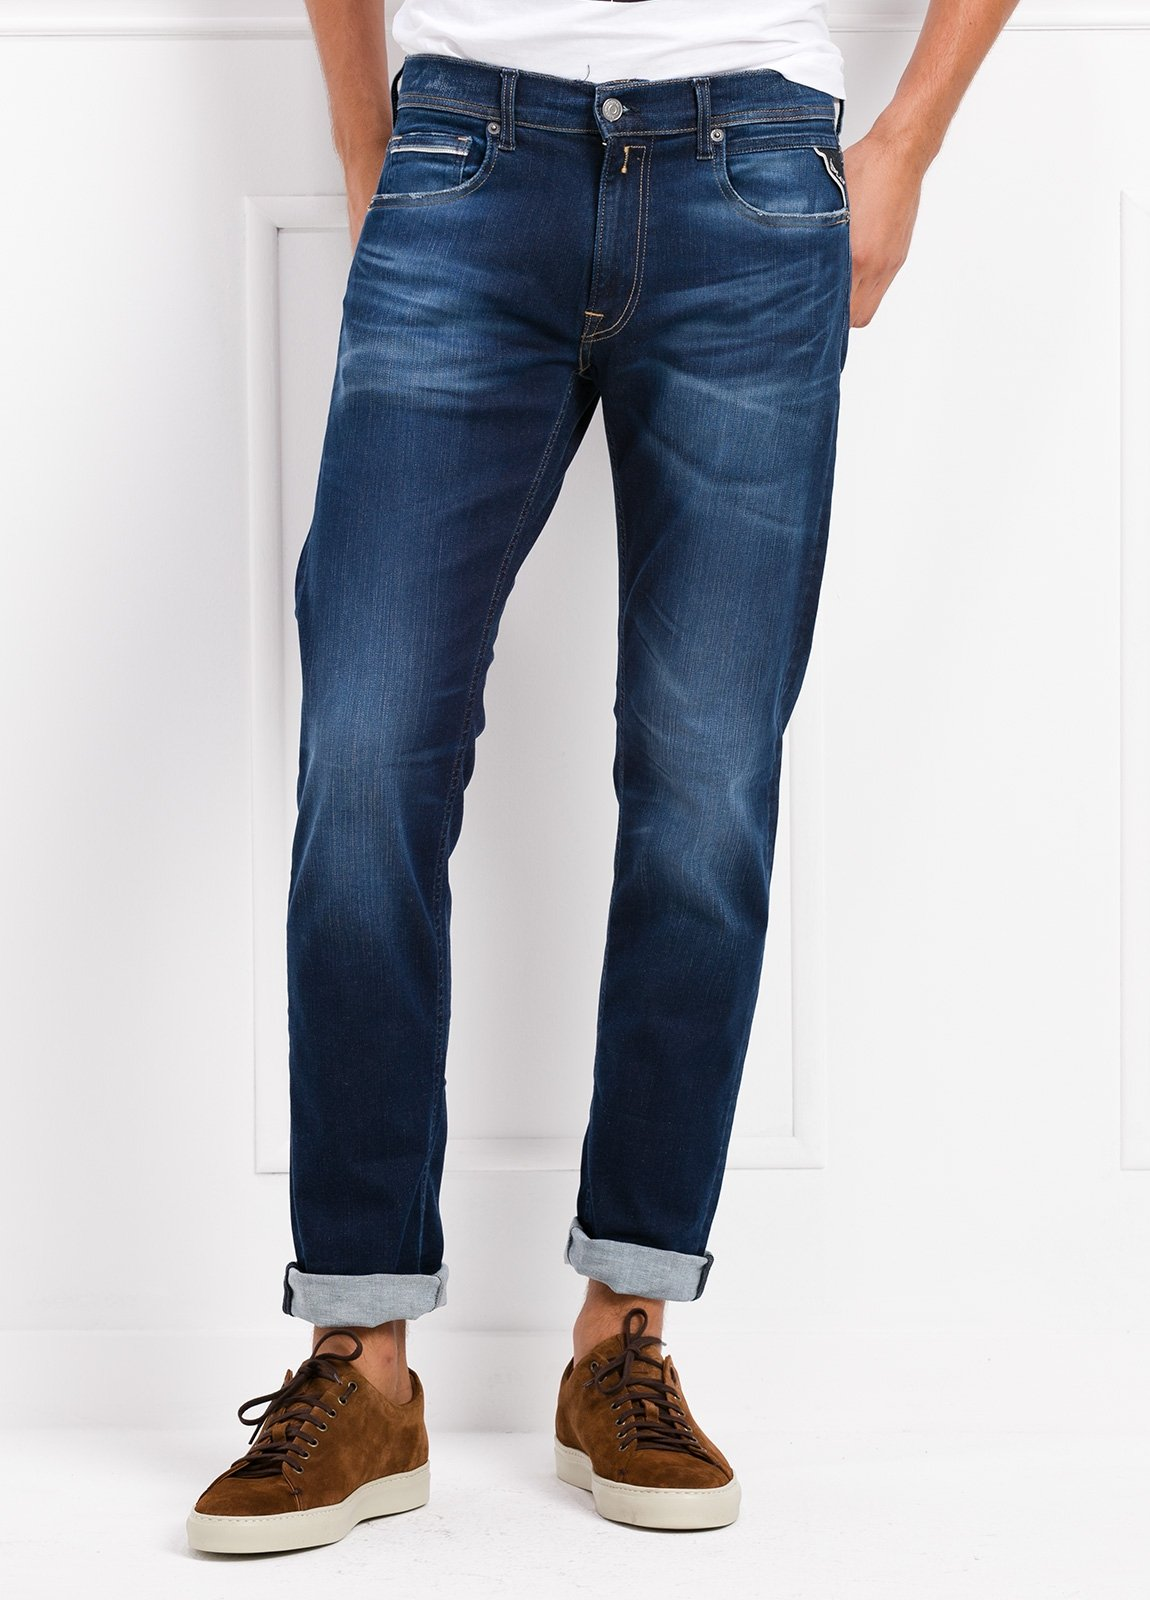 Pantalón tejano corte recto MA972 GROVER color azul lavado. Algodón